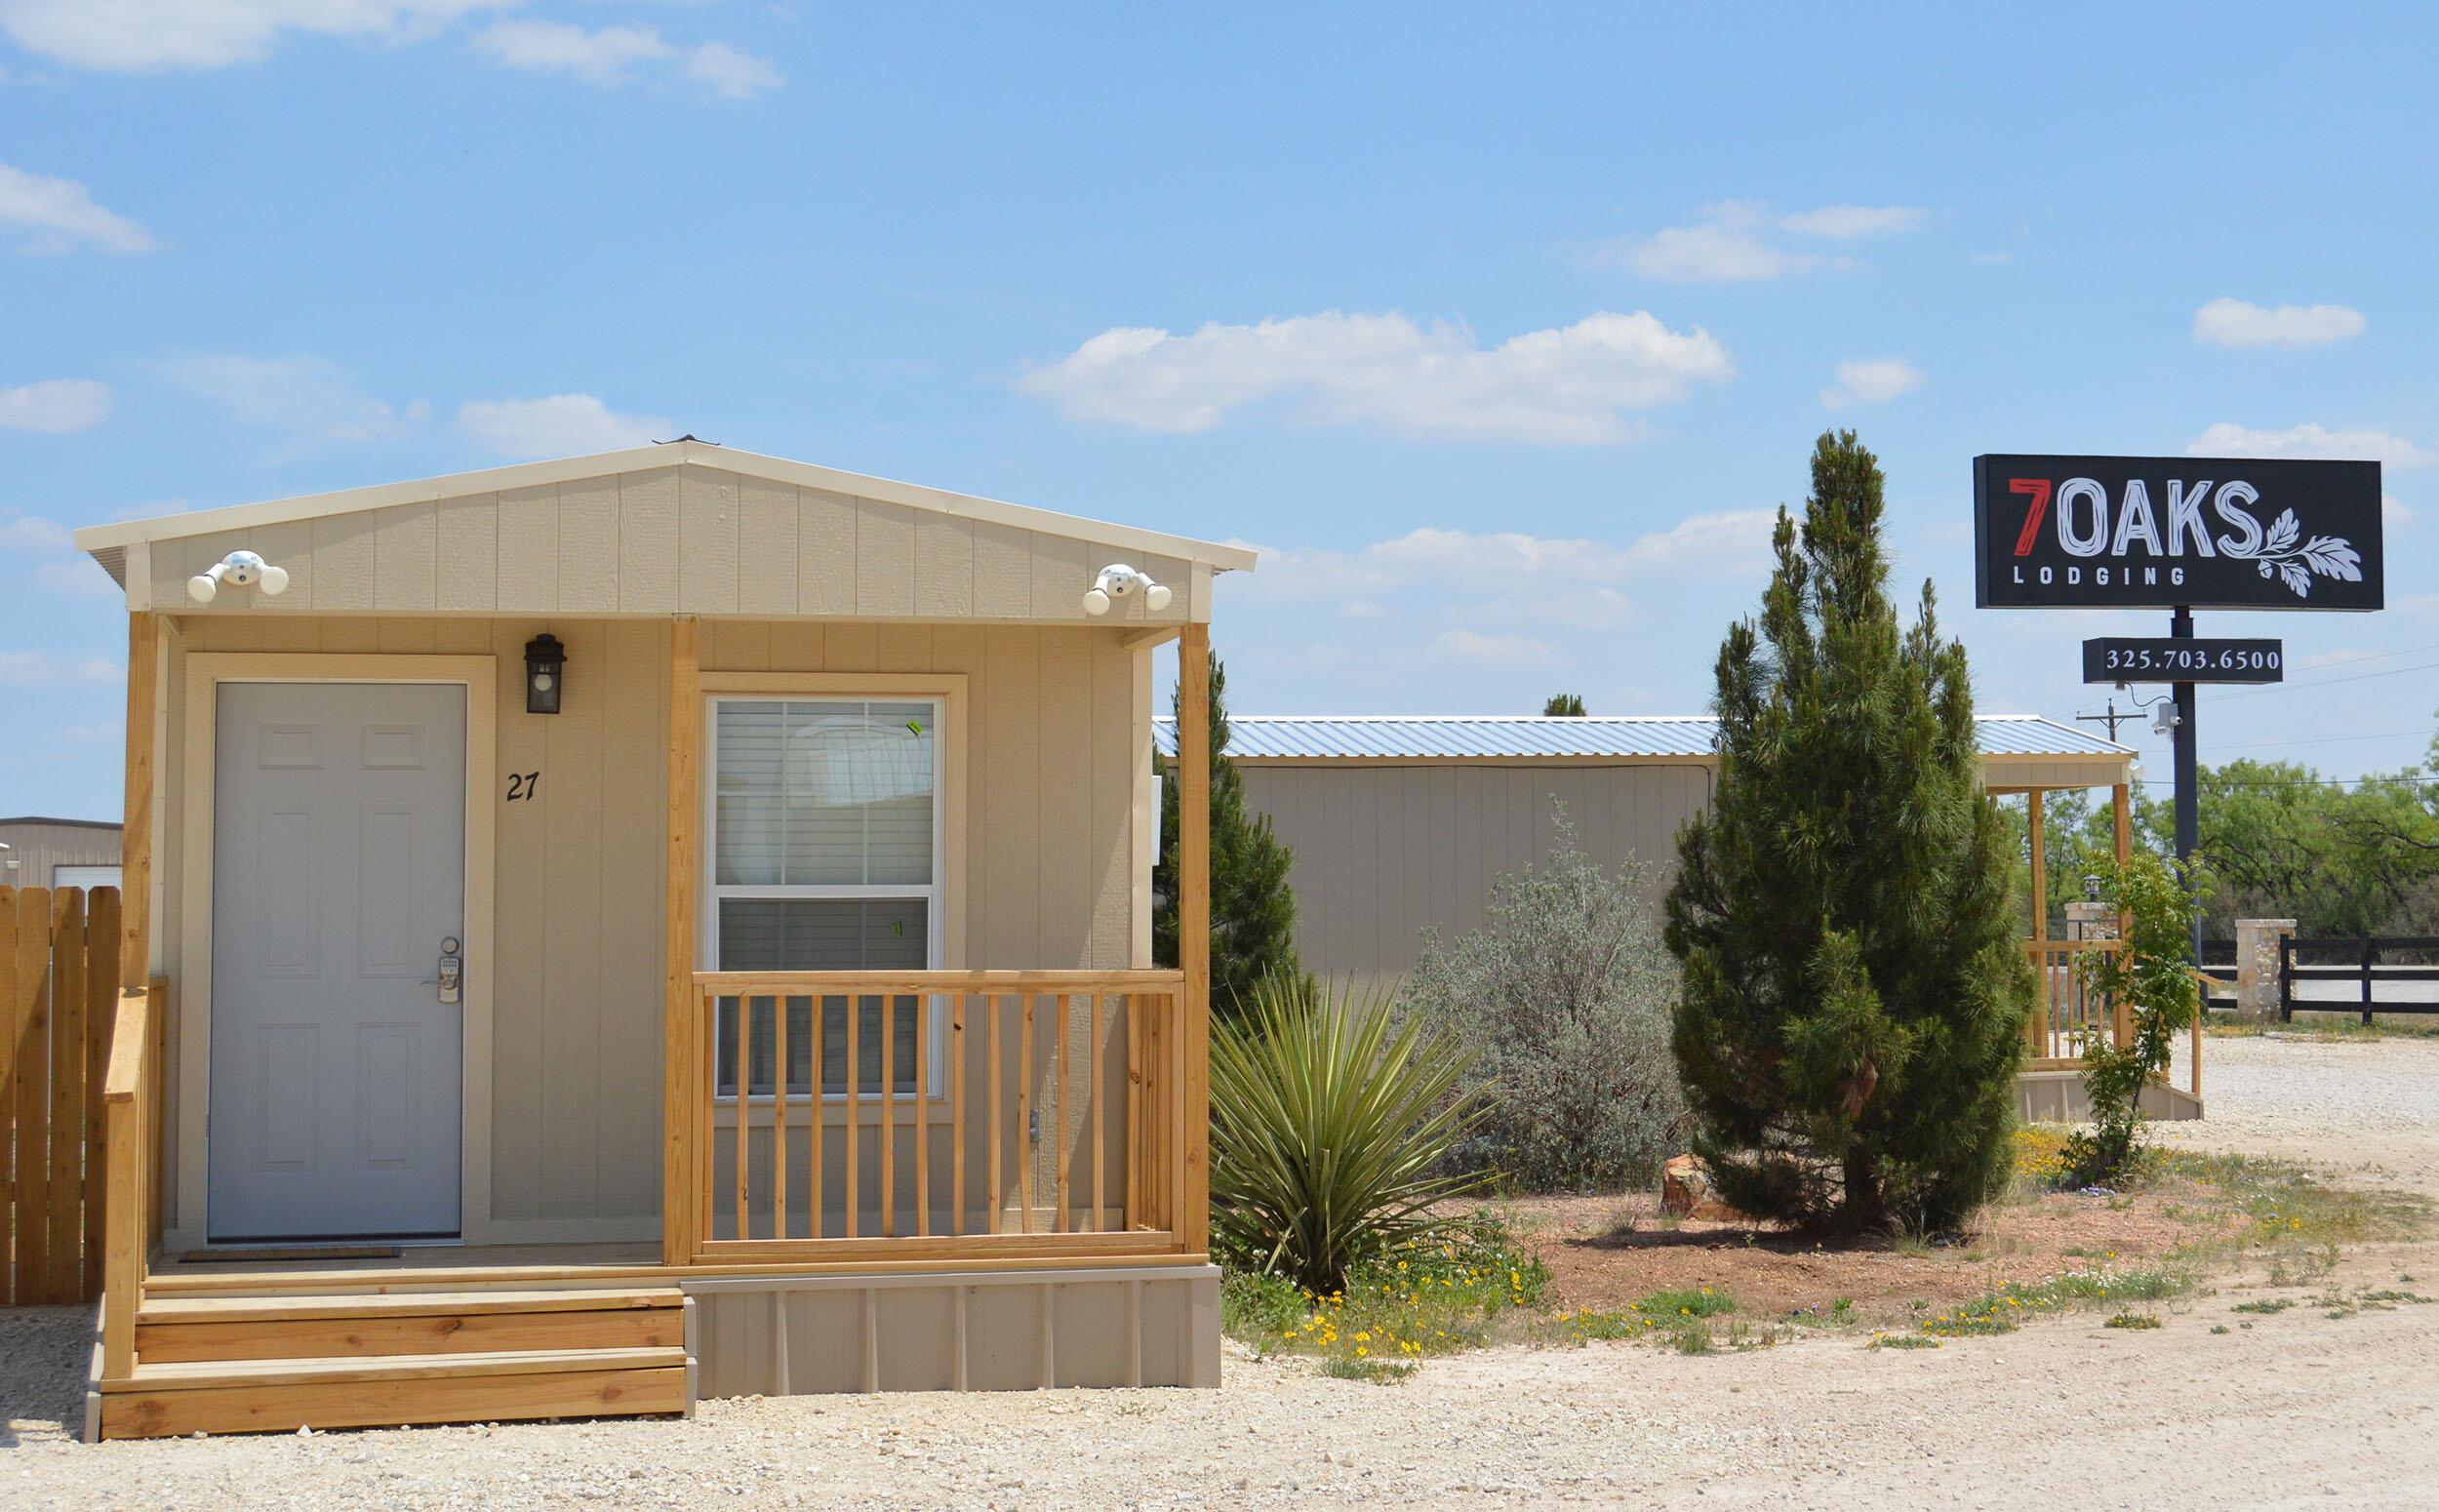 Hotel-San-Angelo-Texas-Man-Camp-7-Oaks-Lodging-35.jpg